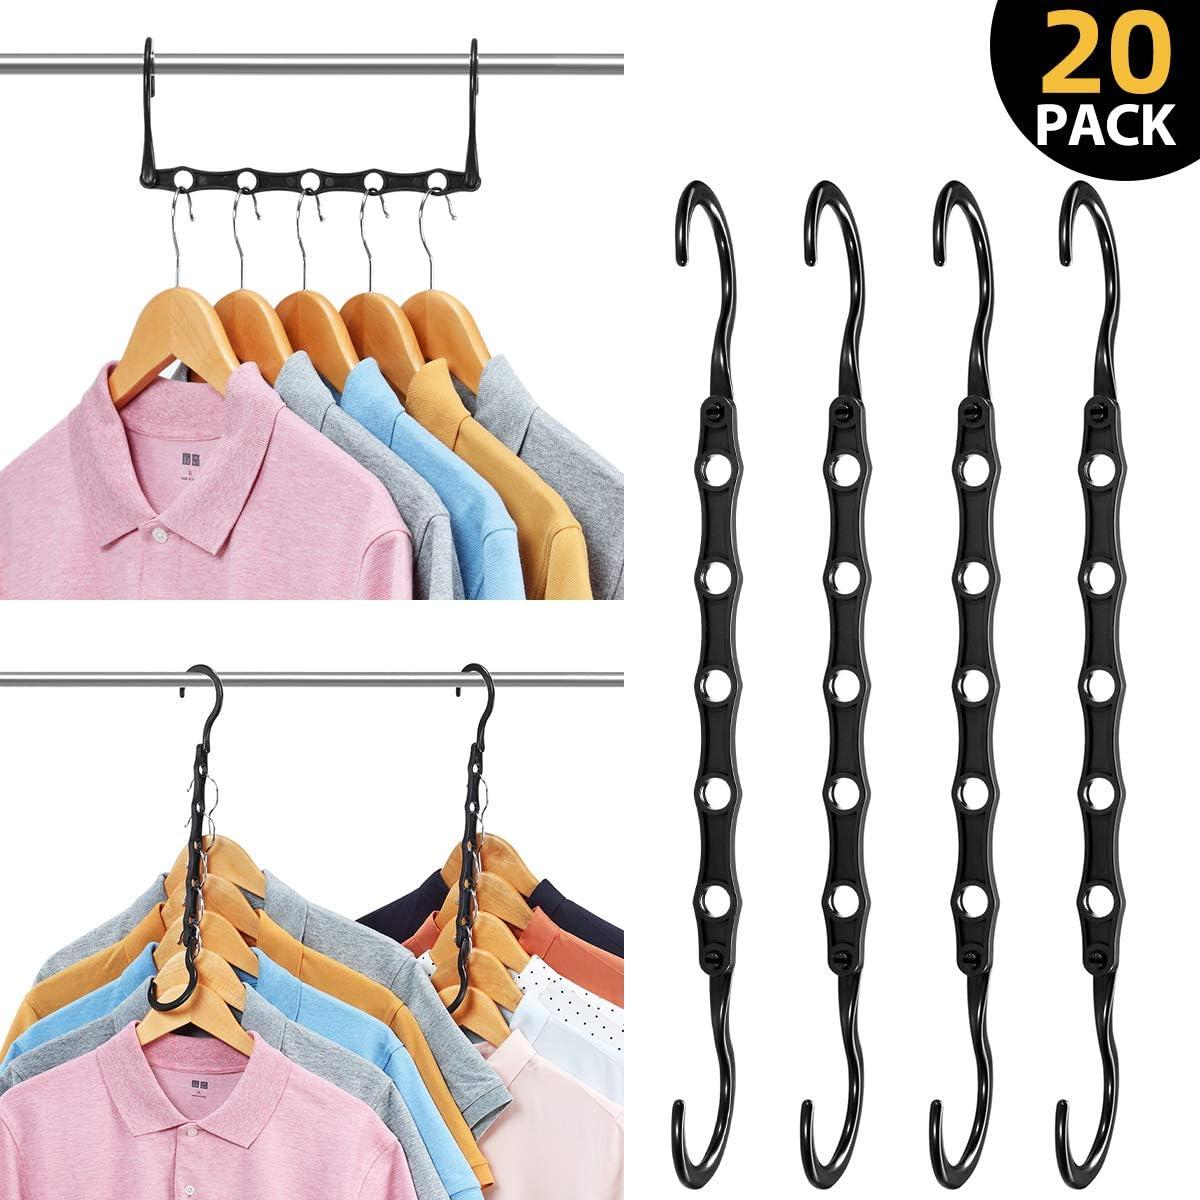 AMKUFO 20 Pack Magic Hangers Space Saving Hangers Closet Space Saver Hanger Organizer Multi Hangers Sturdy Plastic for Heavy Clothes